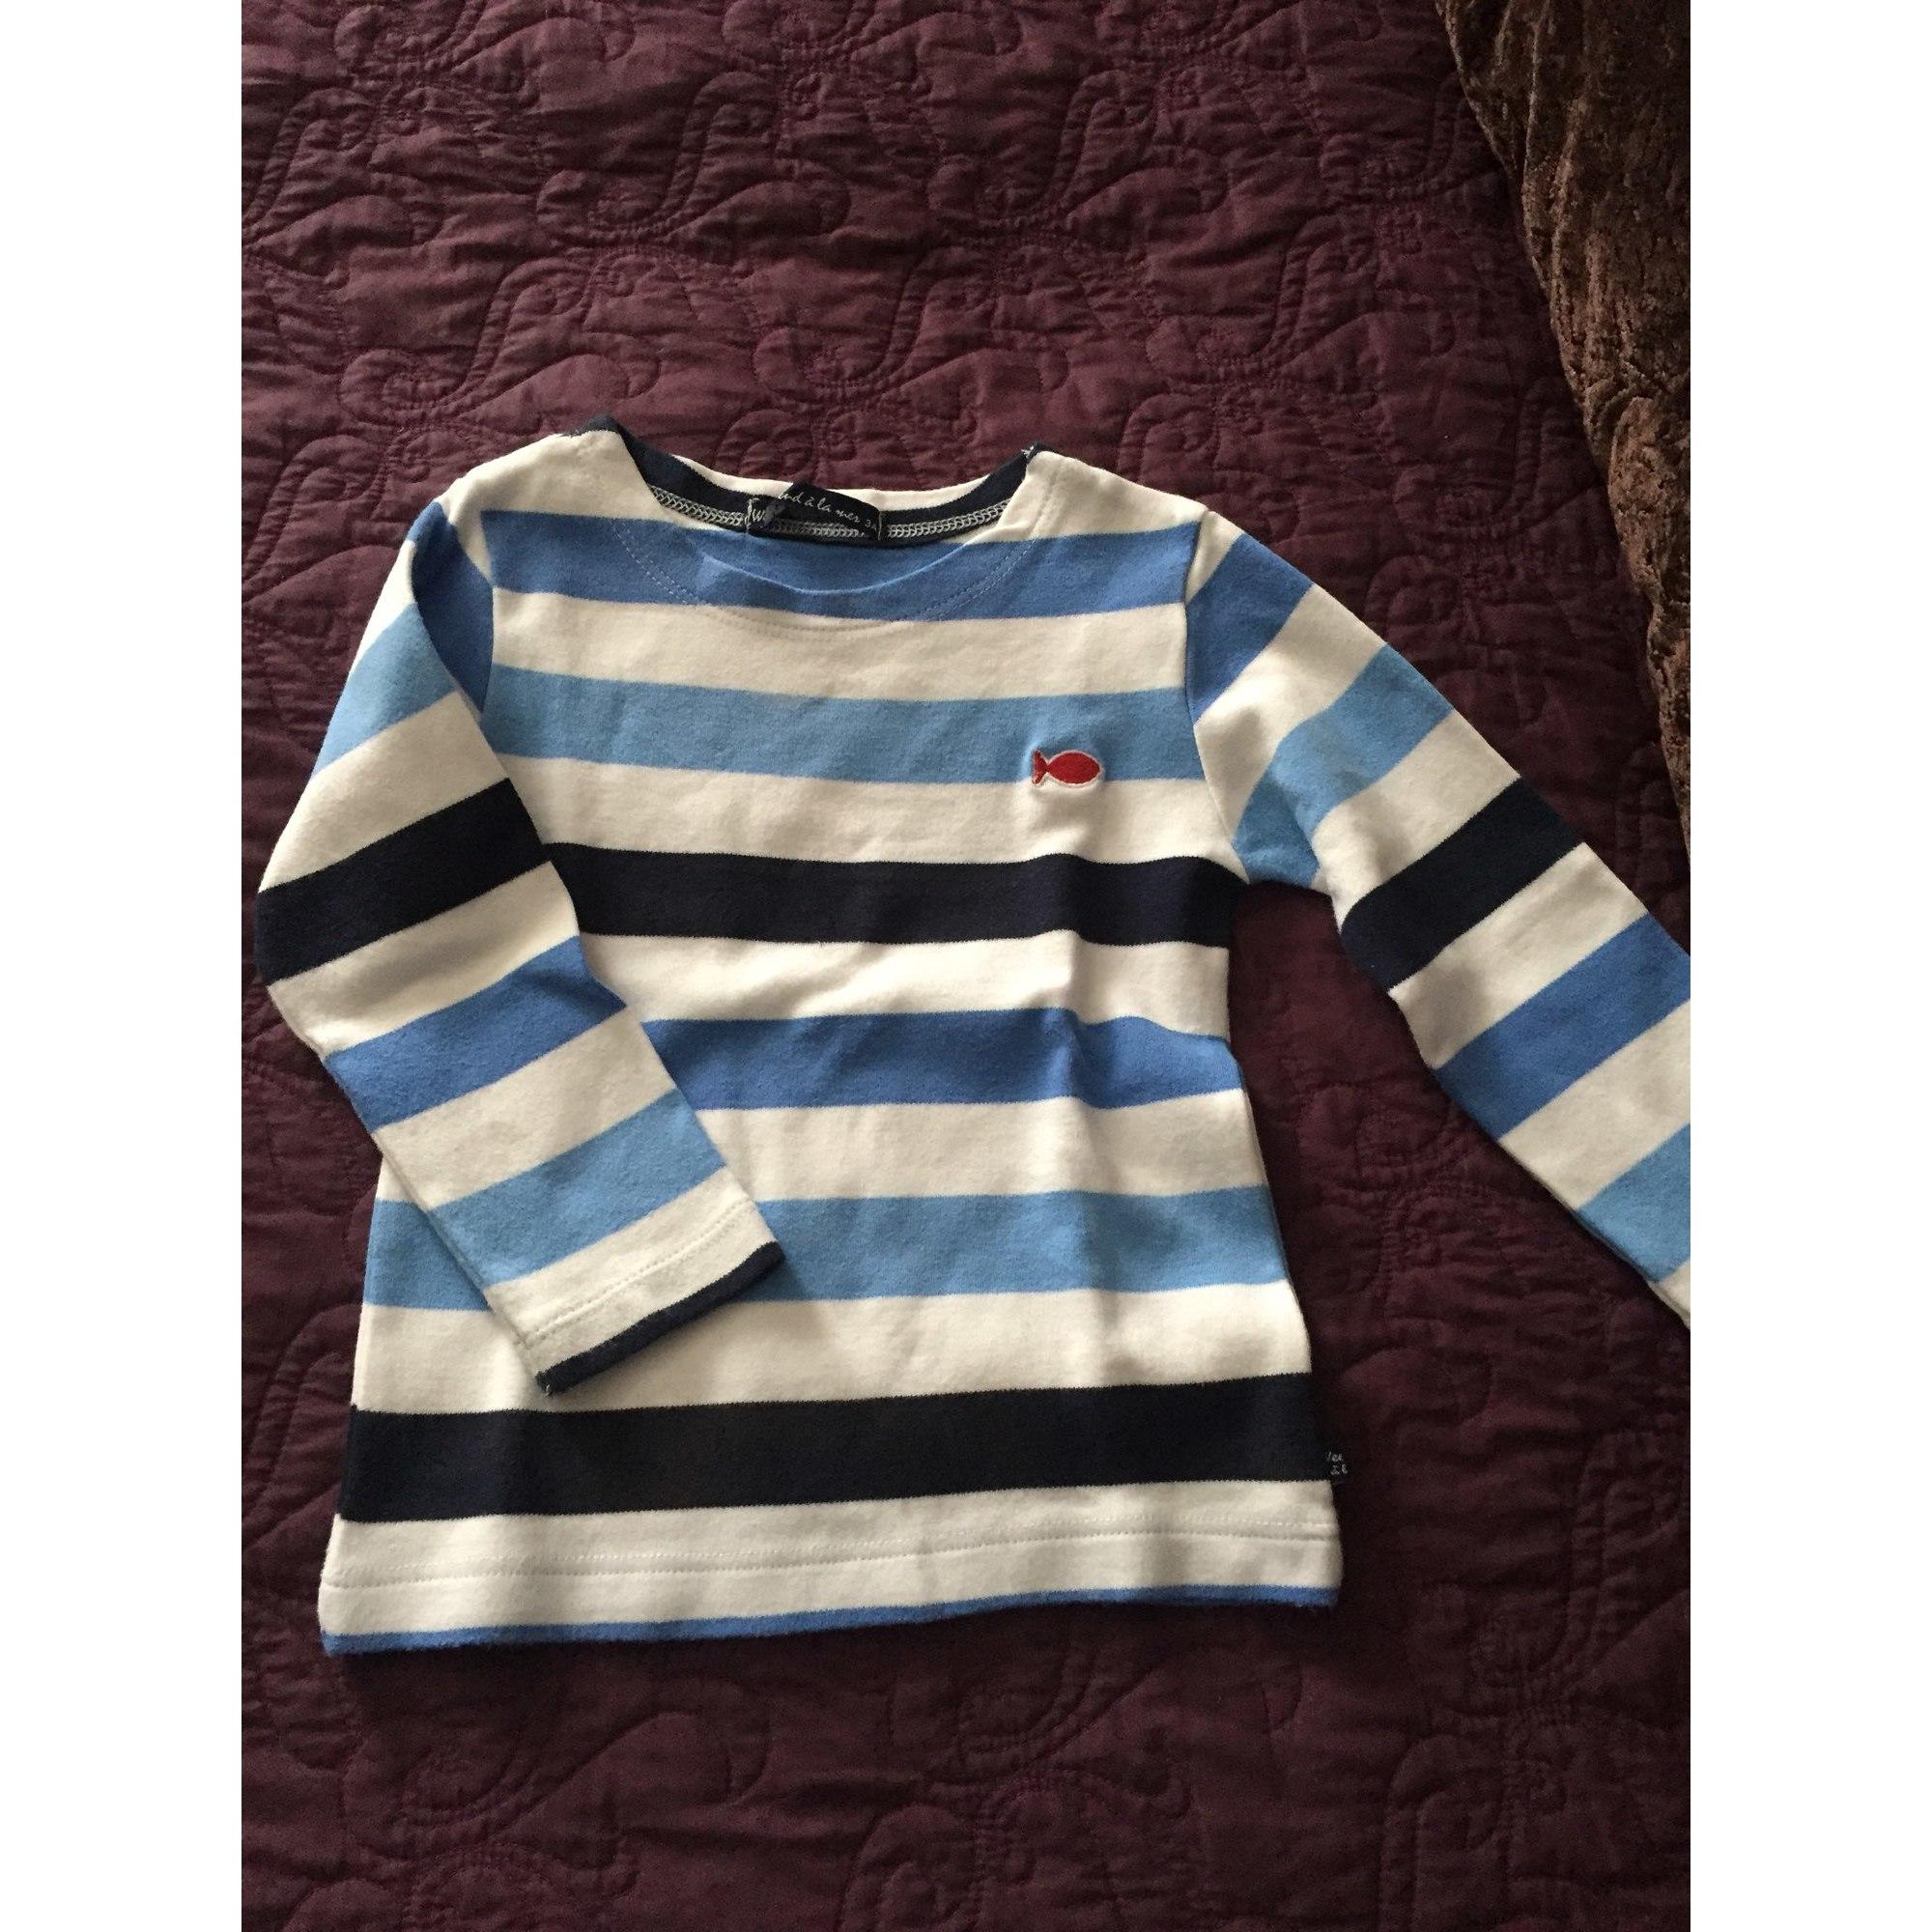 Tee-shirt WEEK-END A LA MER Bleu, bleu marine, bleu turquoise